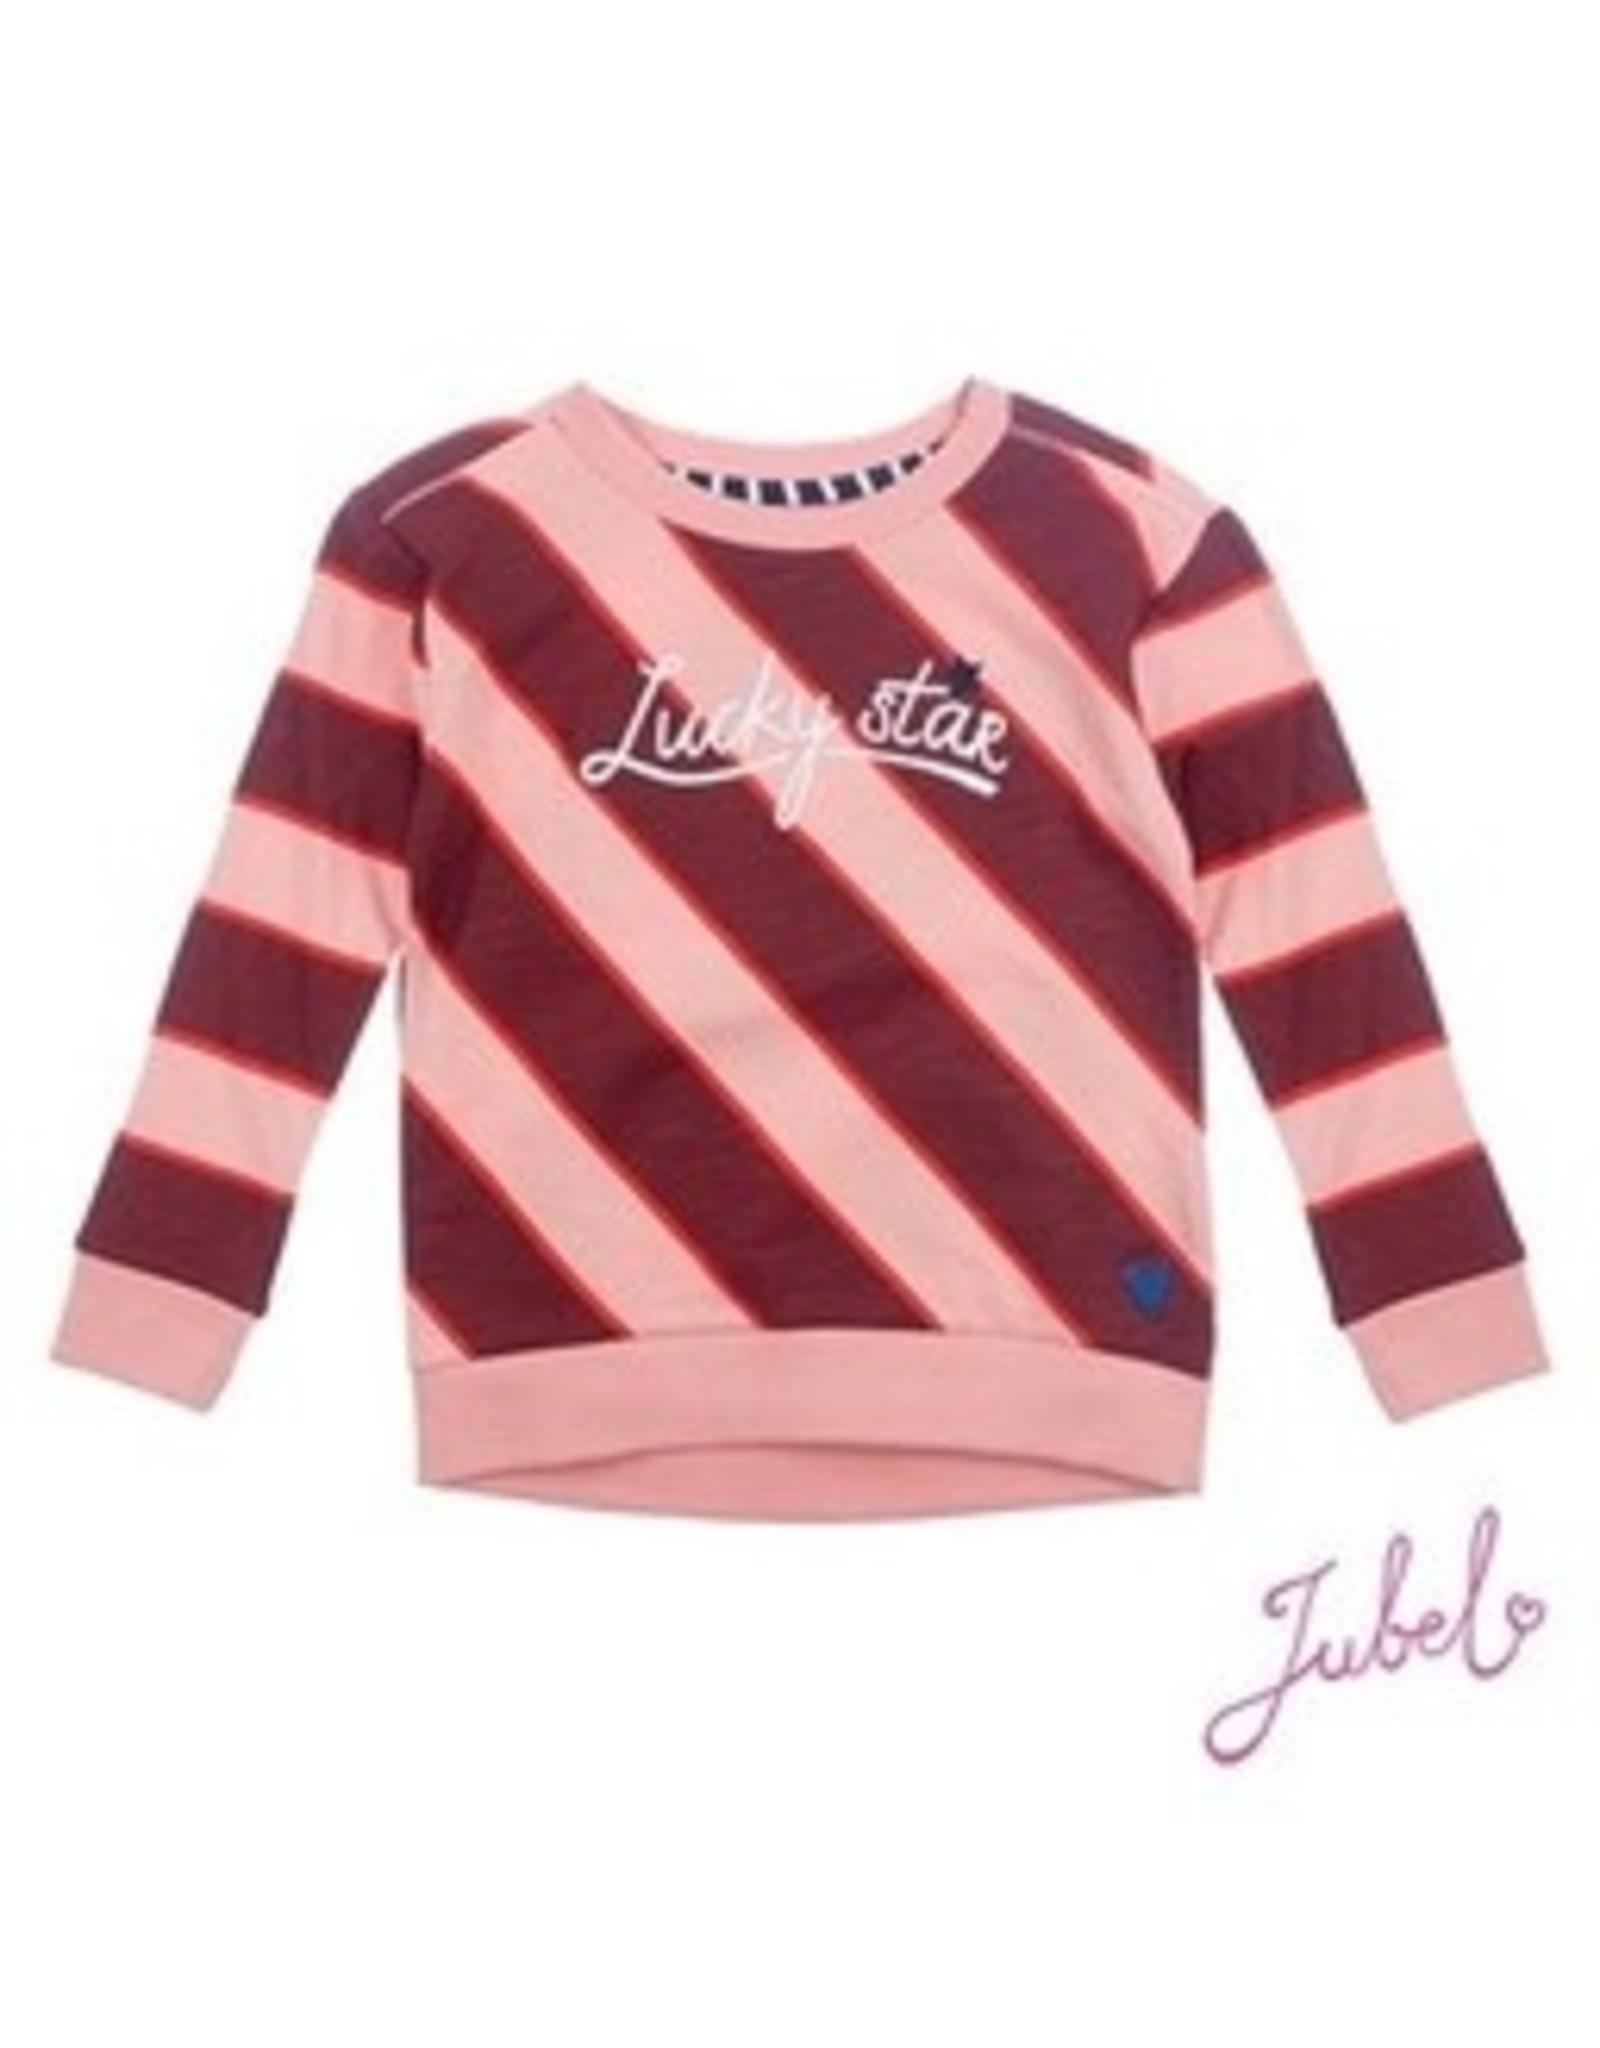 Jubel Sweater streep - Lucky Star maat 128